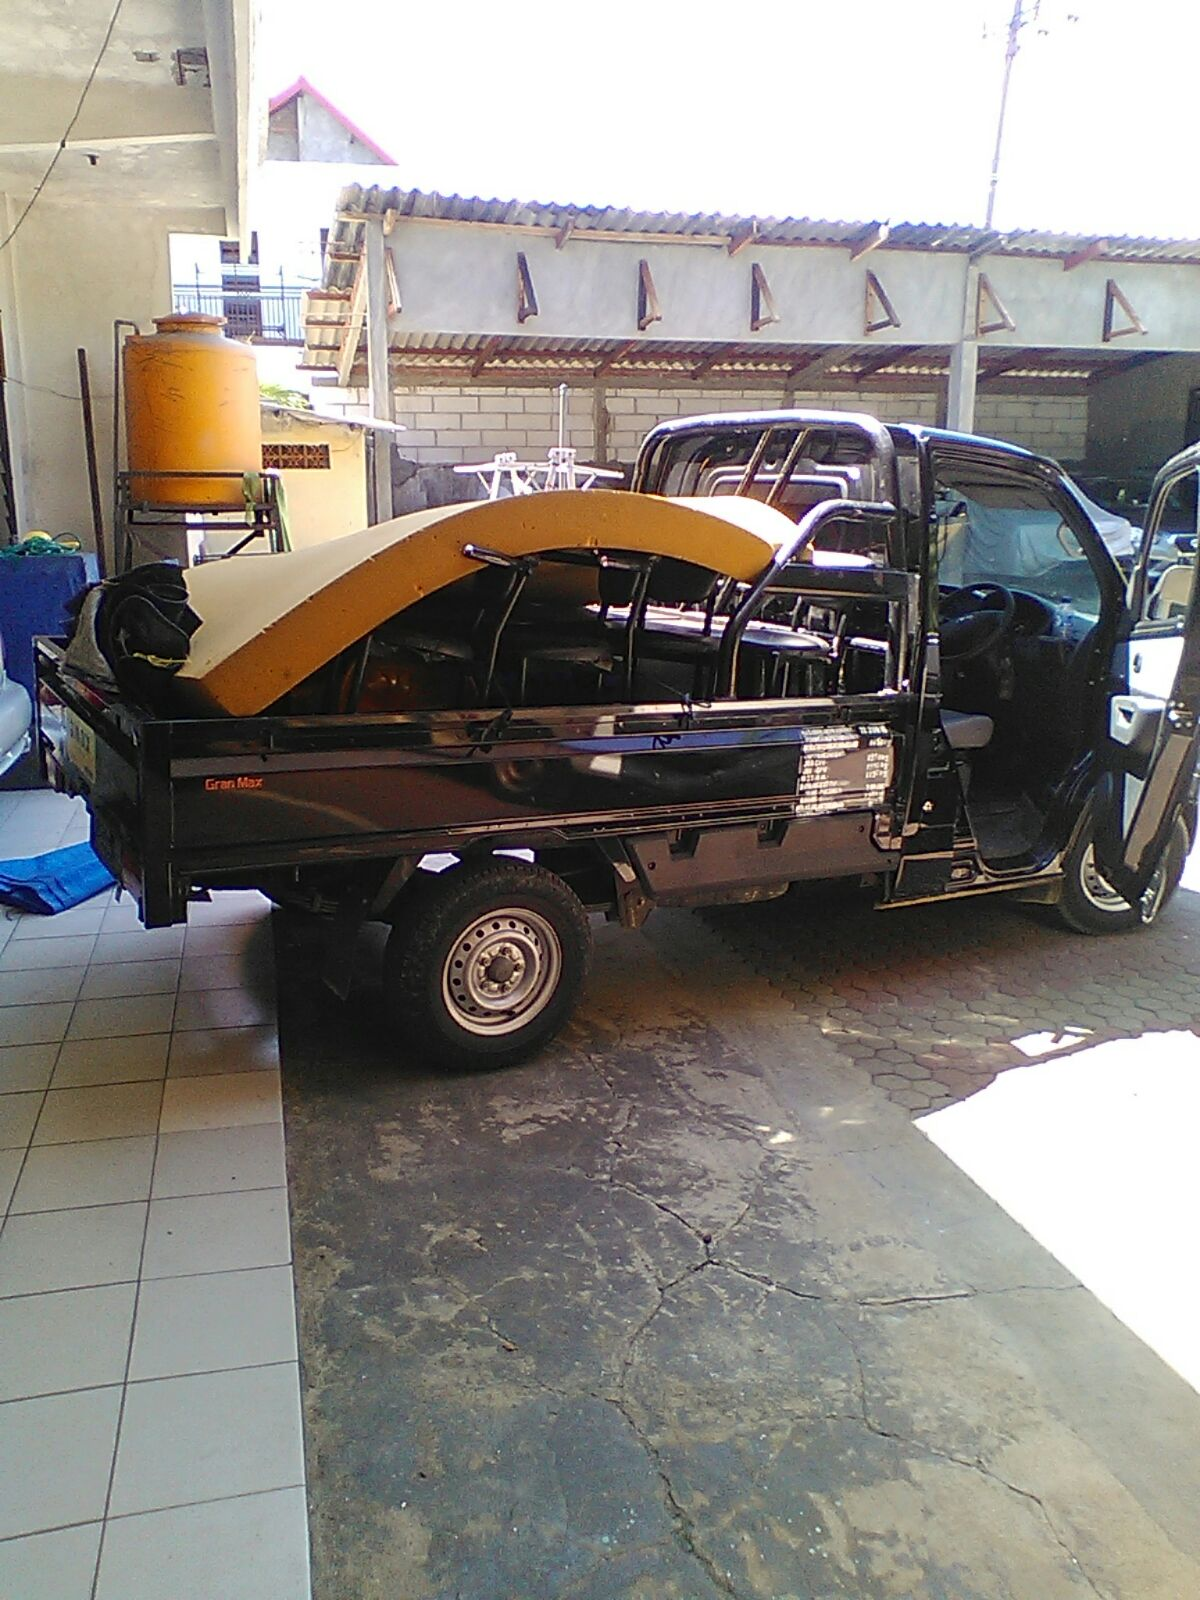 Daftar Harga Terbaru 2021 Pickup Surabaya Sewa Pickup Surabaya 082231060099 Cara Mudah Sewa Mobil Pickup Di Surabaya Sewapickupsurabaya Com